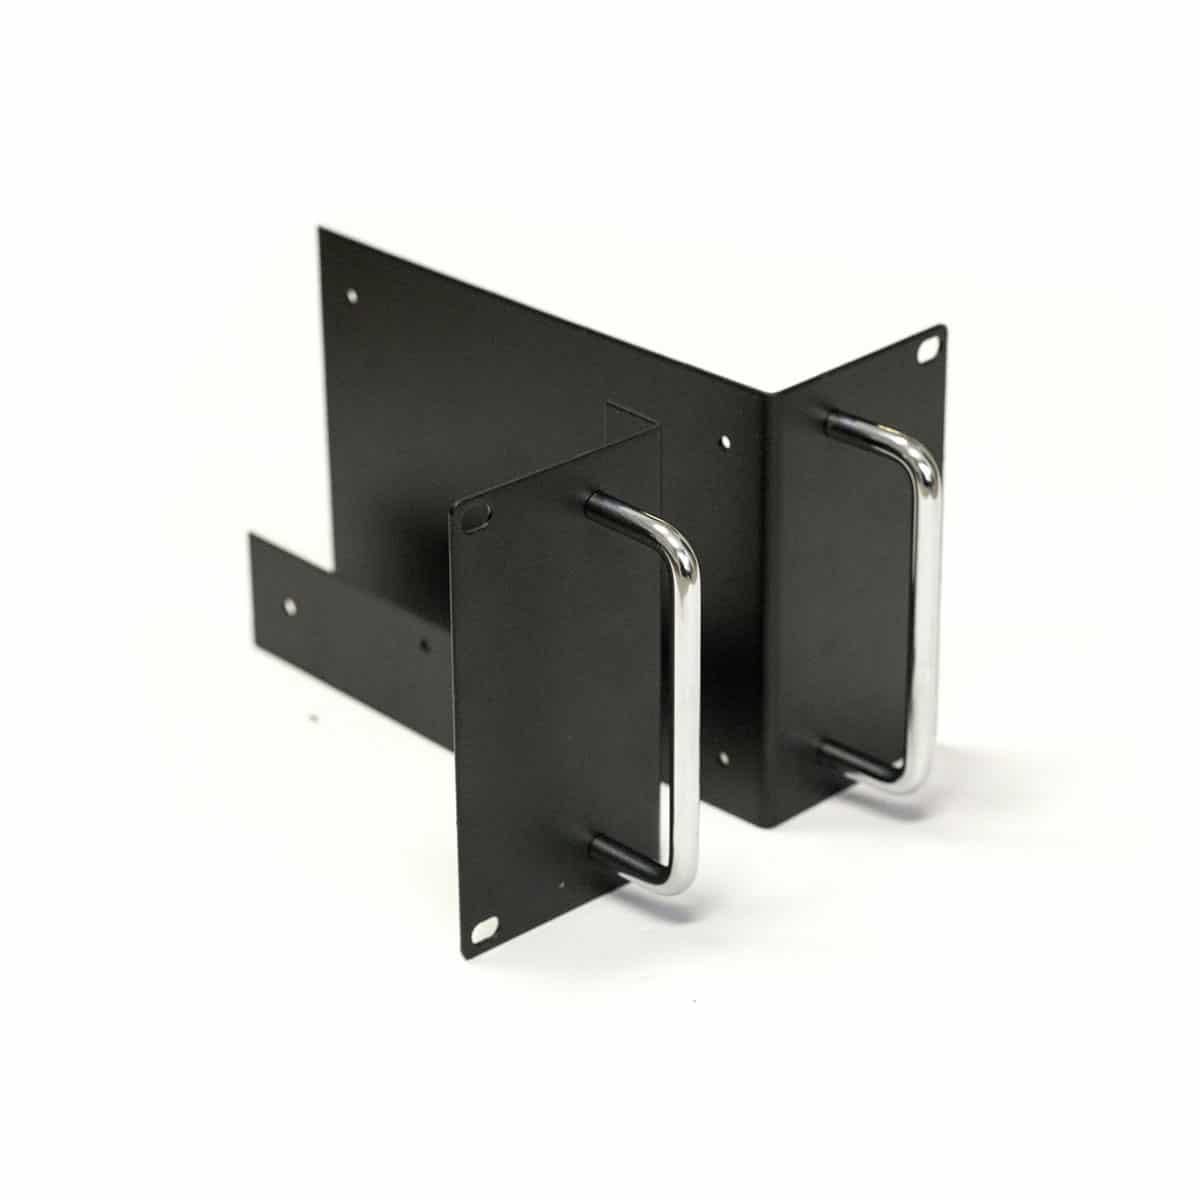 Rupert Neve R6 Six Space 500 Series Rack Pro Audio, Accessori, Lunchbox Rupert Neve R6 05